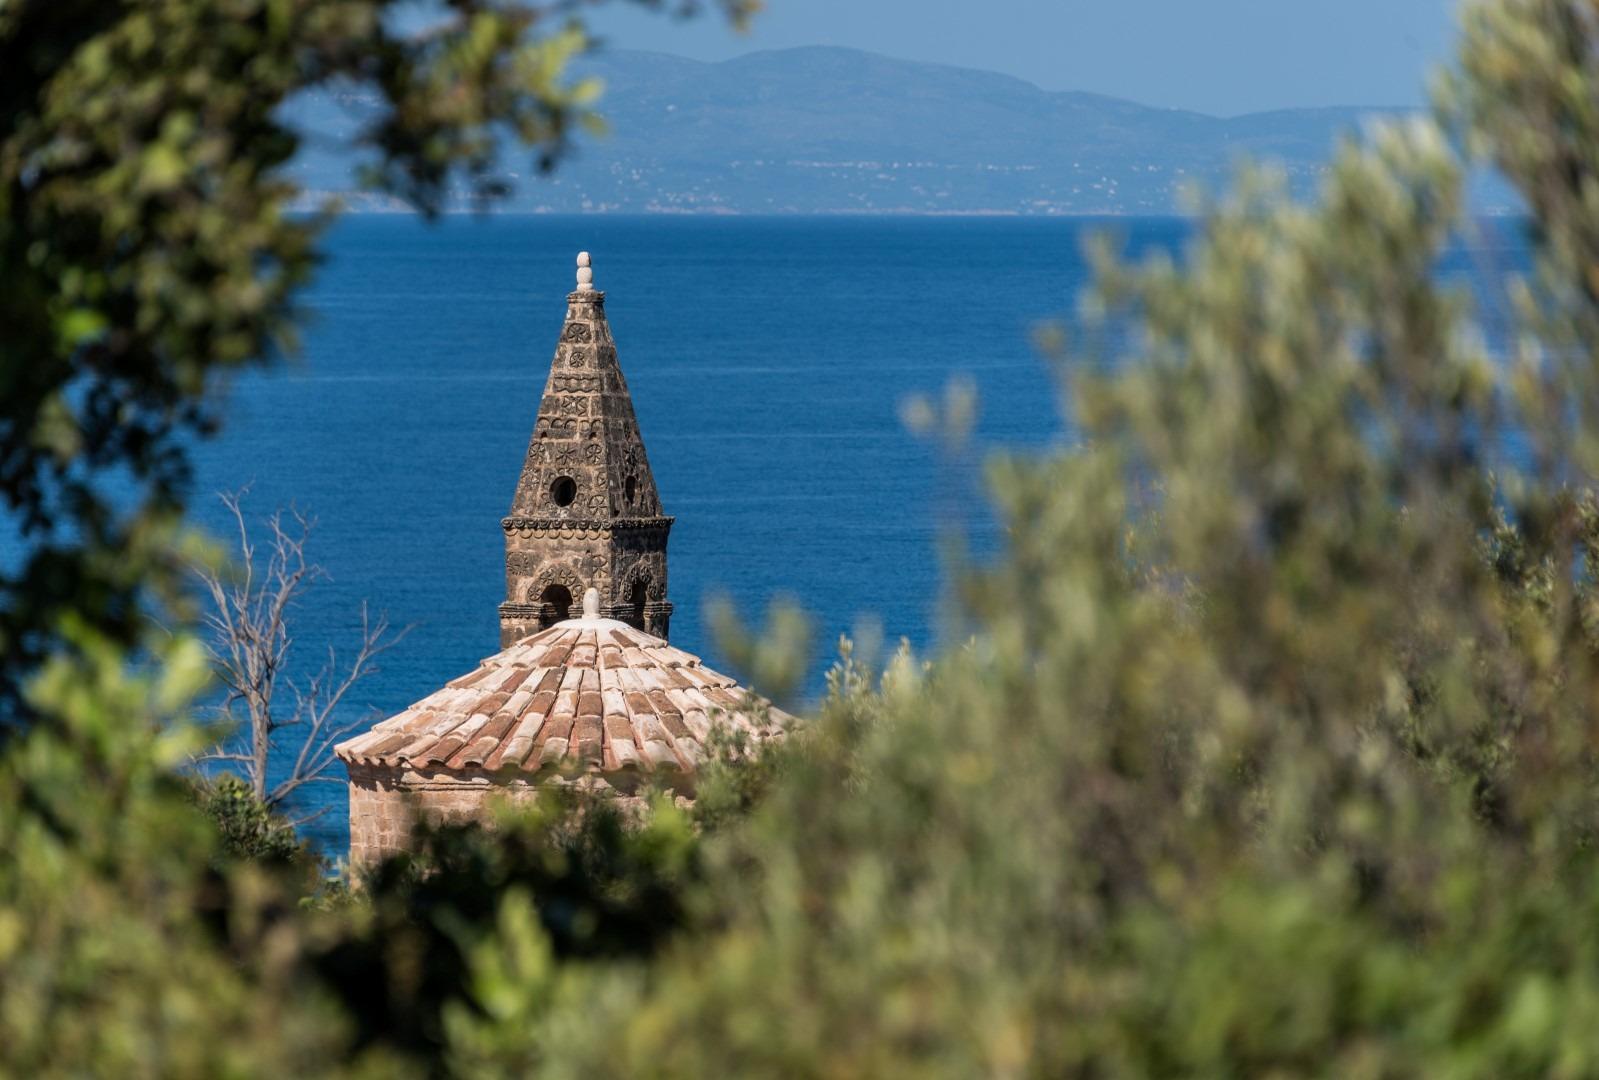 Day 4: Kardamyli - Moni Sotiros - Vyros Gorge - Kardamyli (Hiking tour).